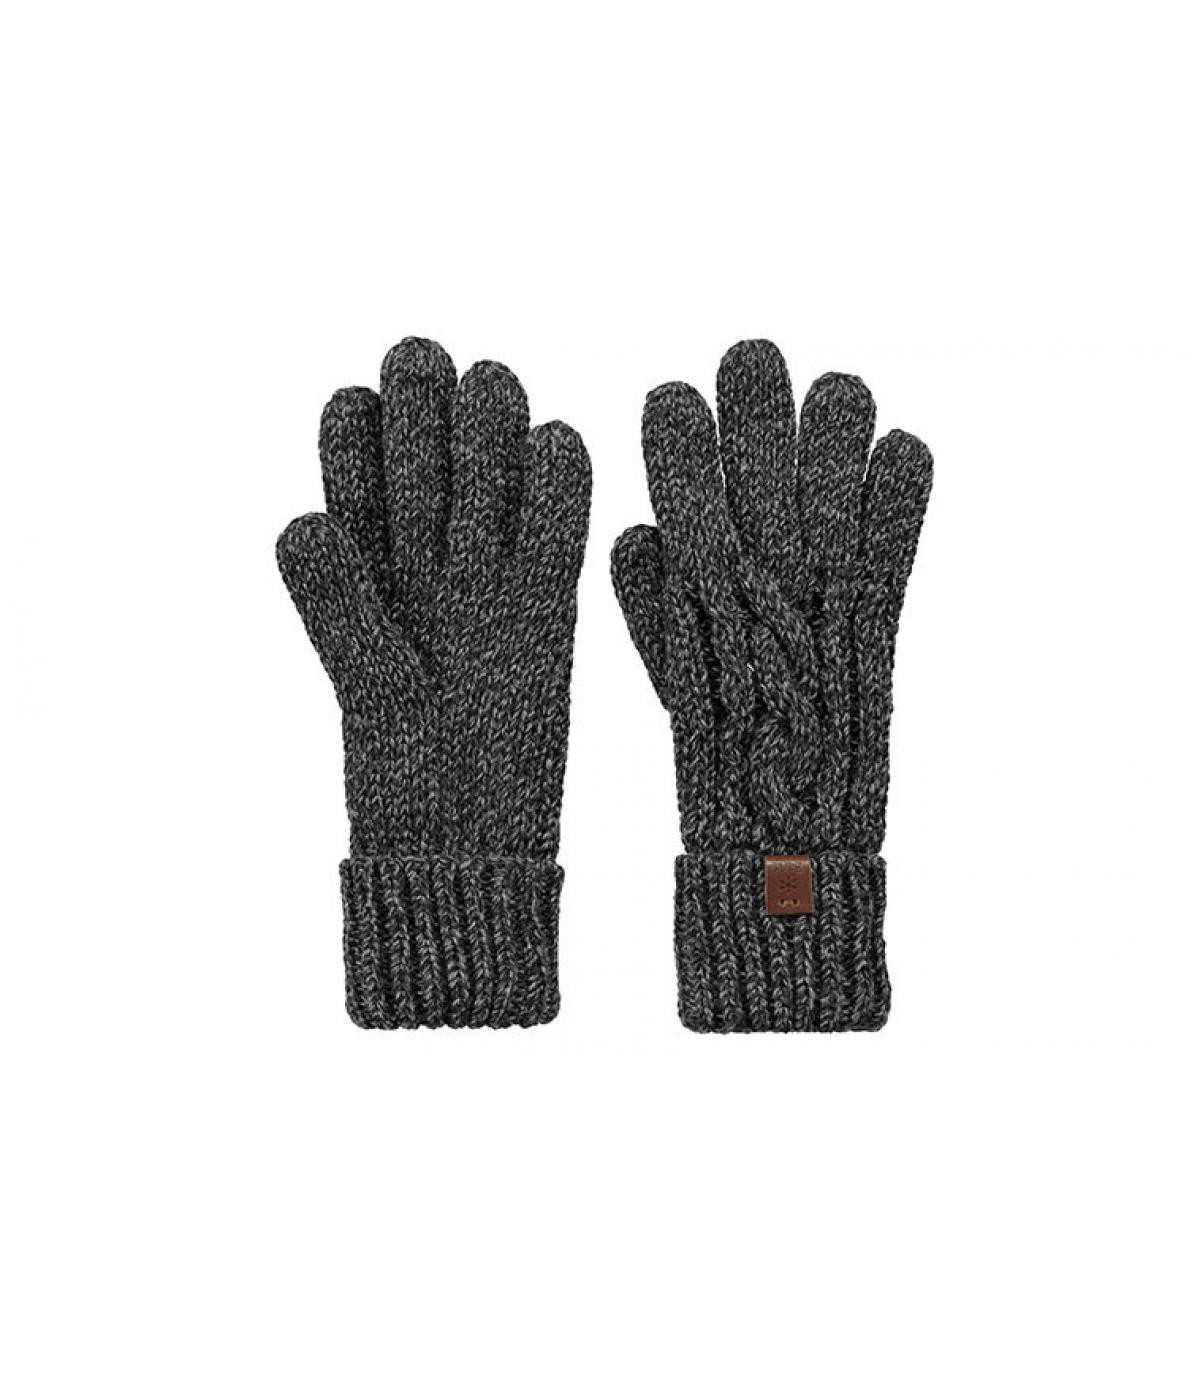 Detalles Twister Gloves black imagen 2